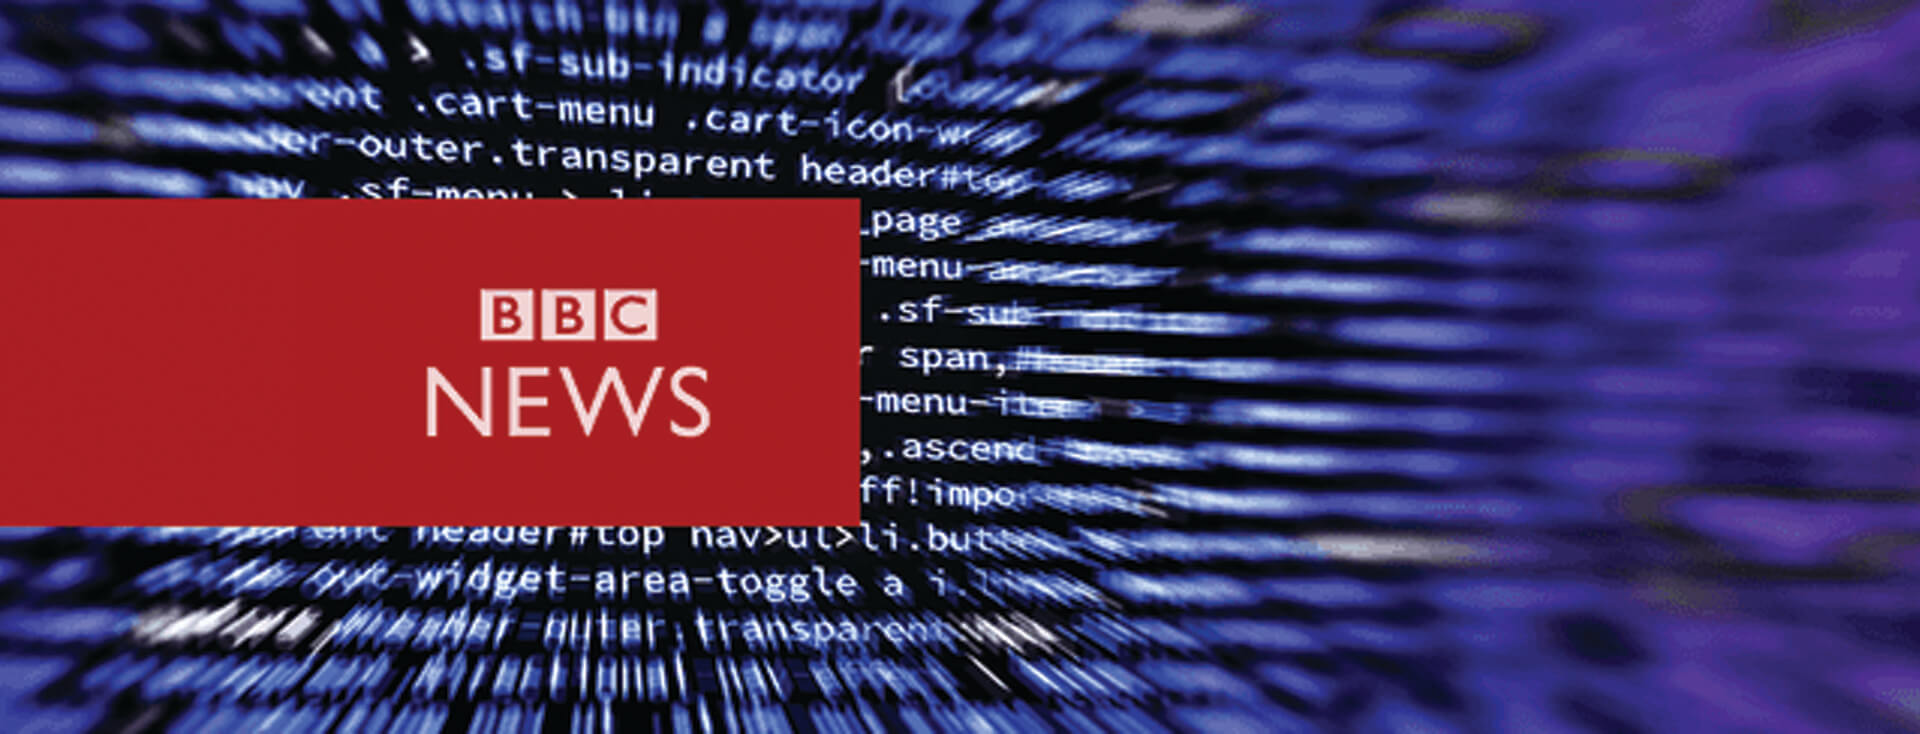 BBC news blog image